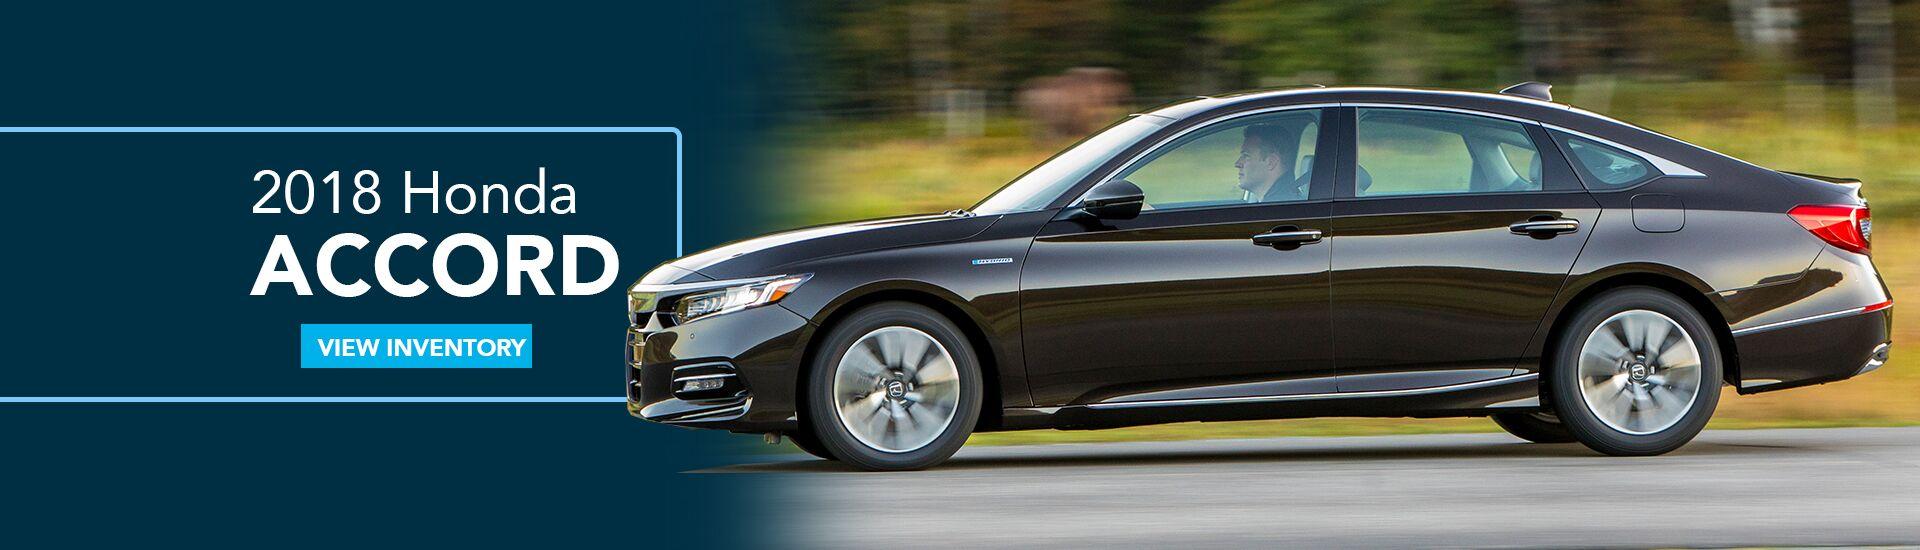 Acura Dealership Houston >> Honda Dealership Meridian MS | Used Cars Meridian Honda